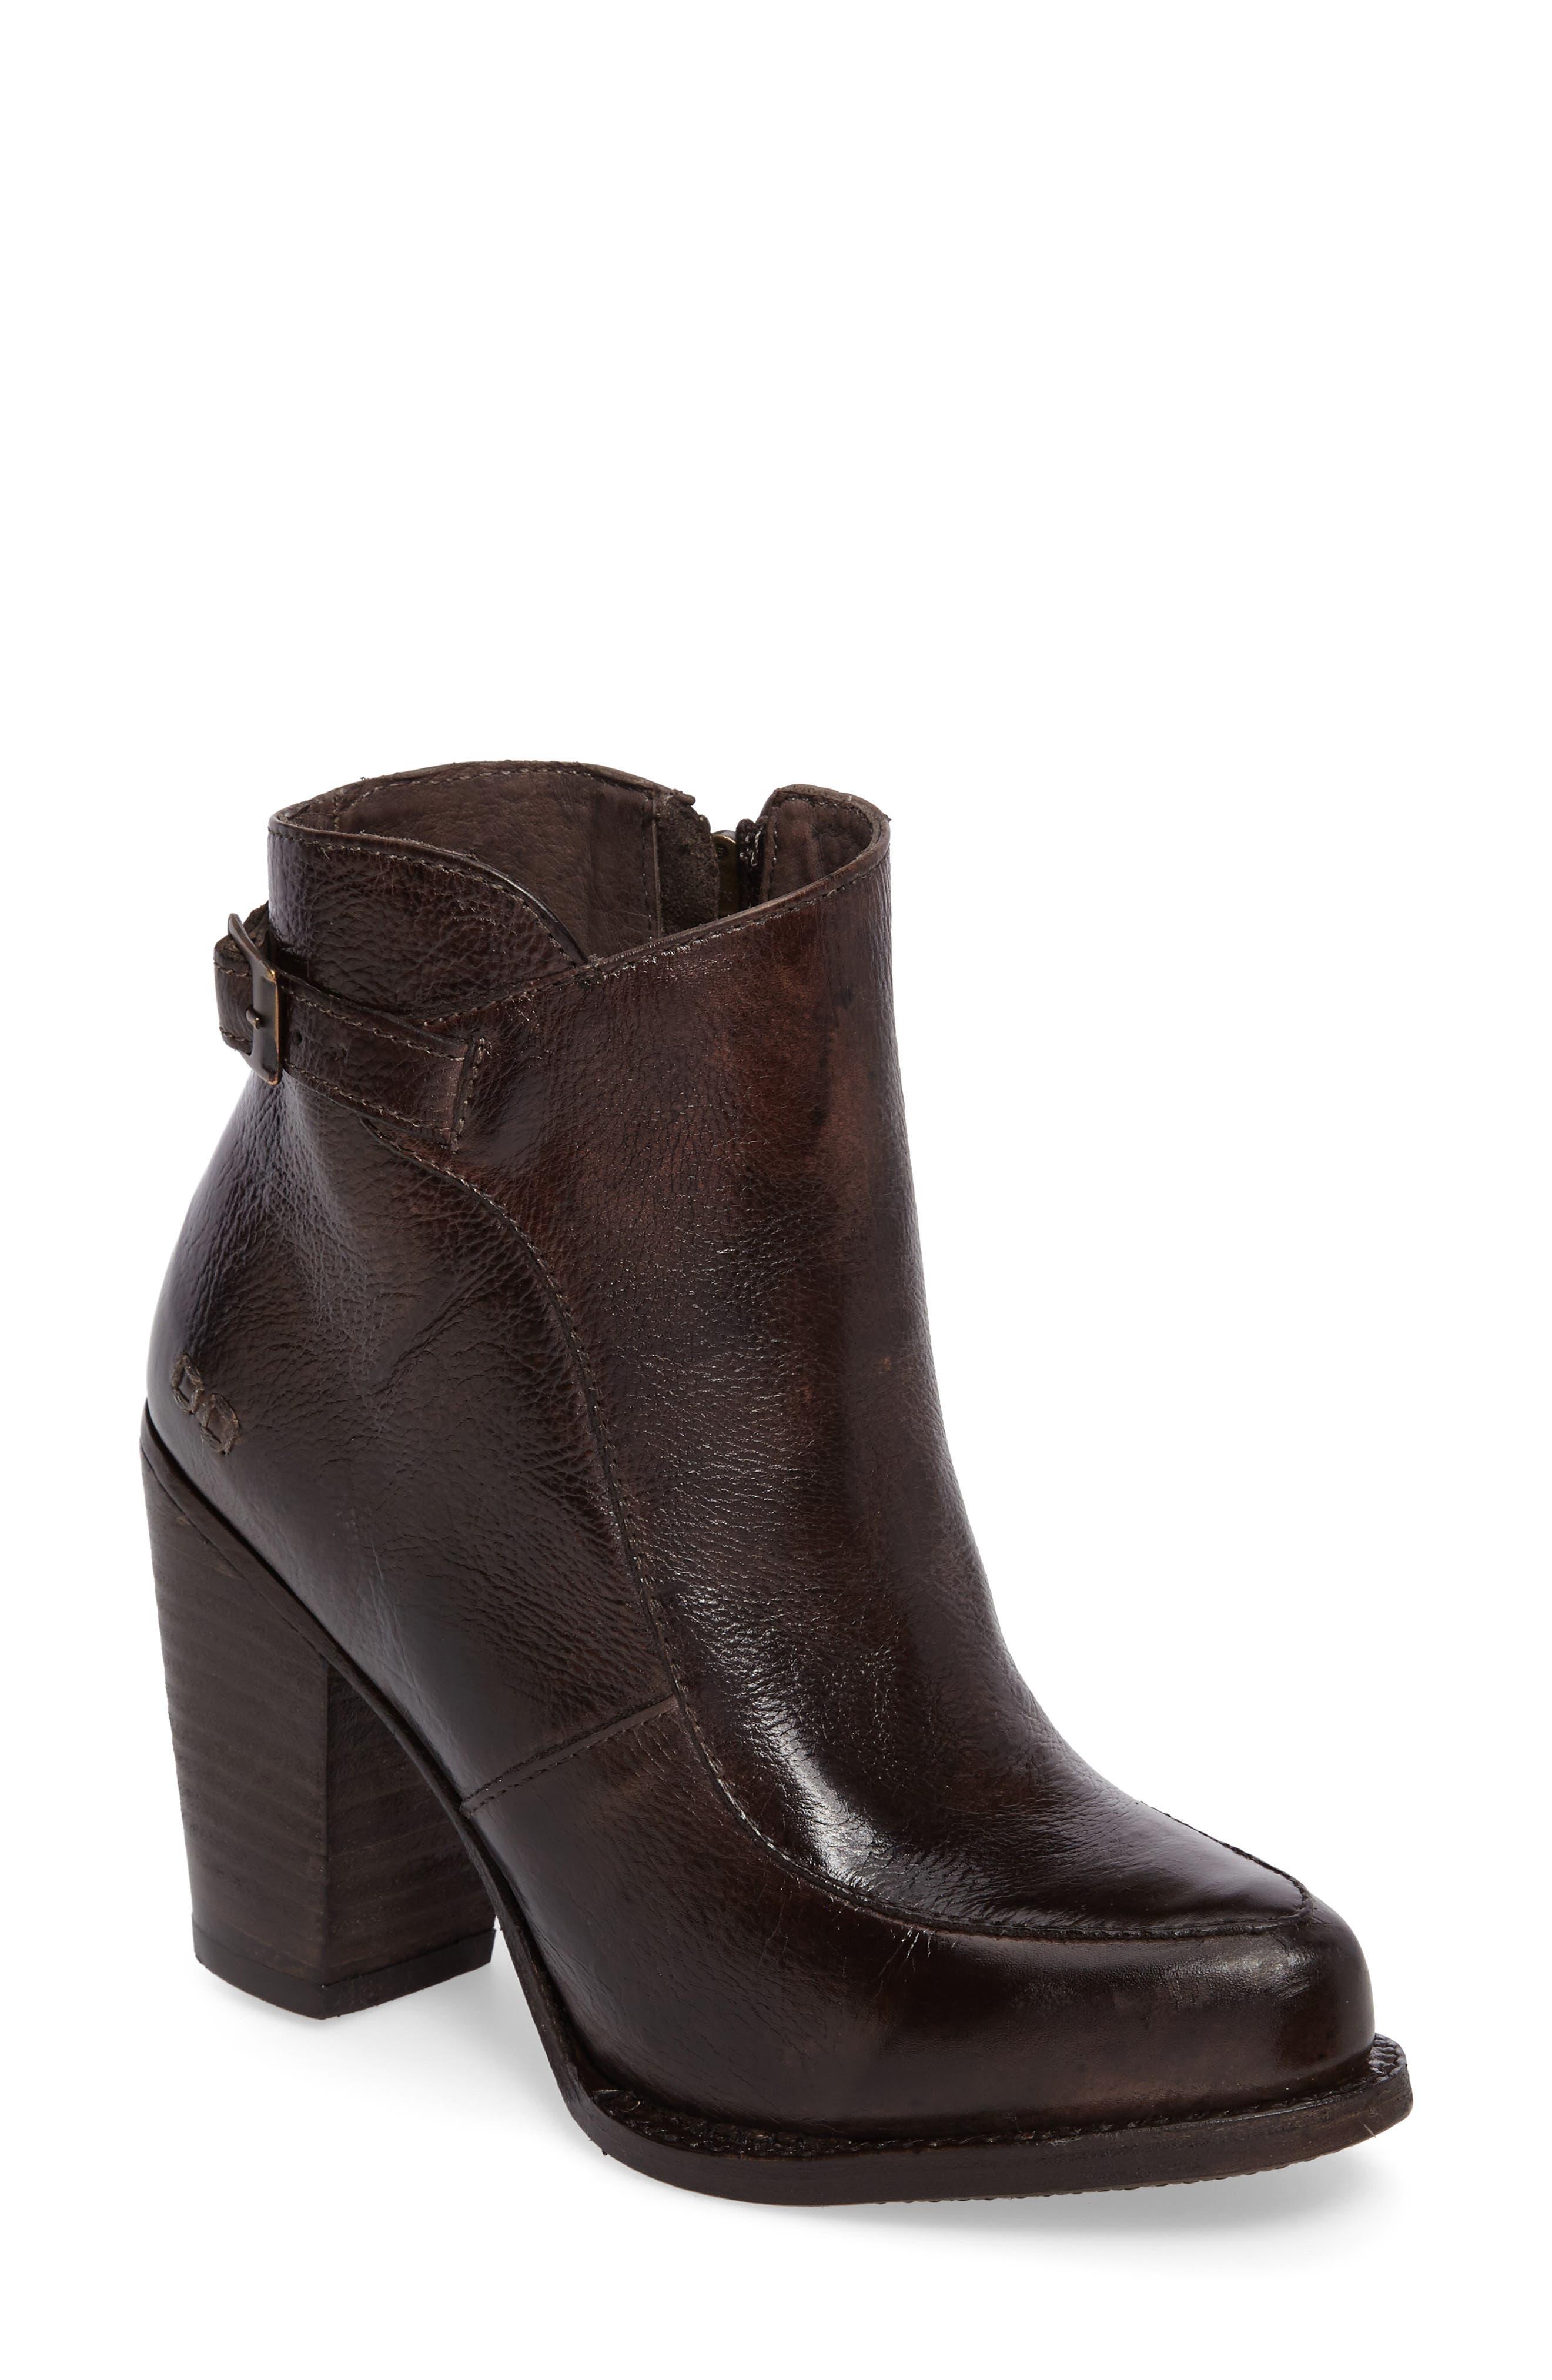 Main Image - Bed Stu 'Isla' Stacked Heel Boot (Women)